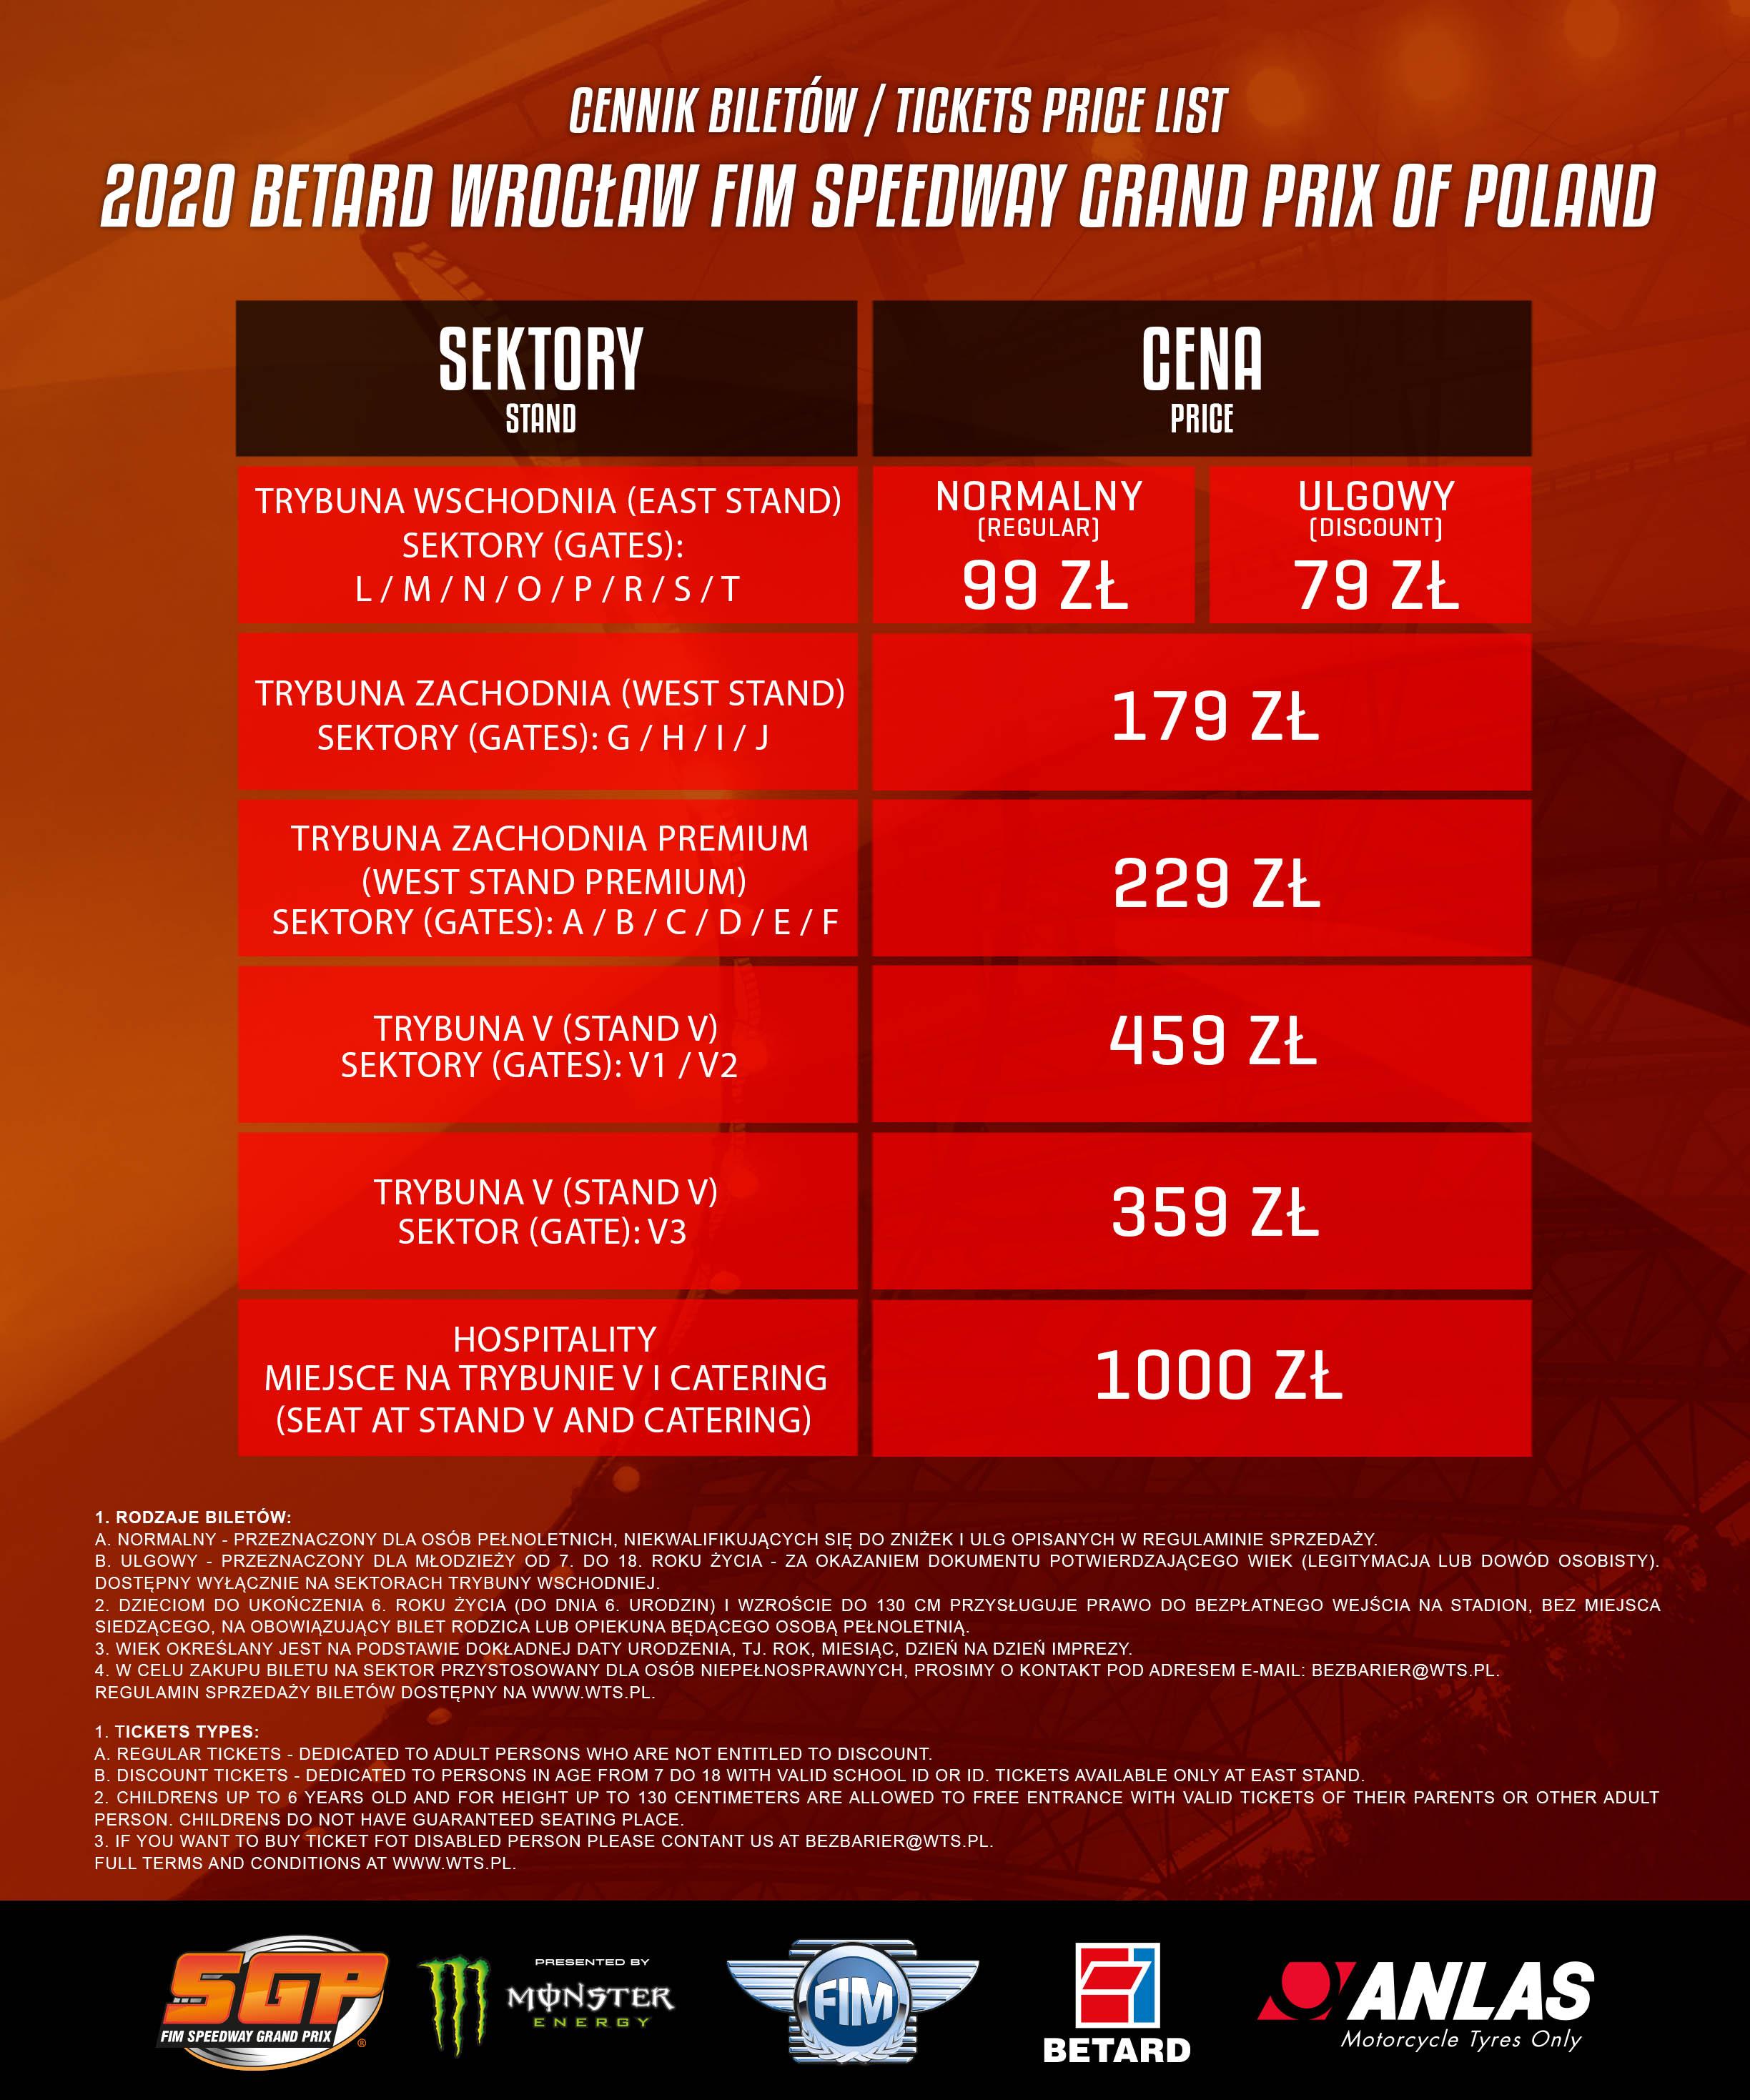 cennik- SGP2020-wroclaw